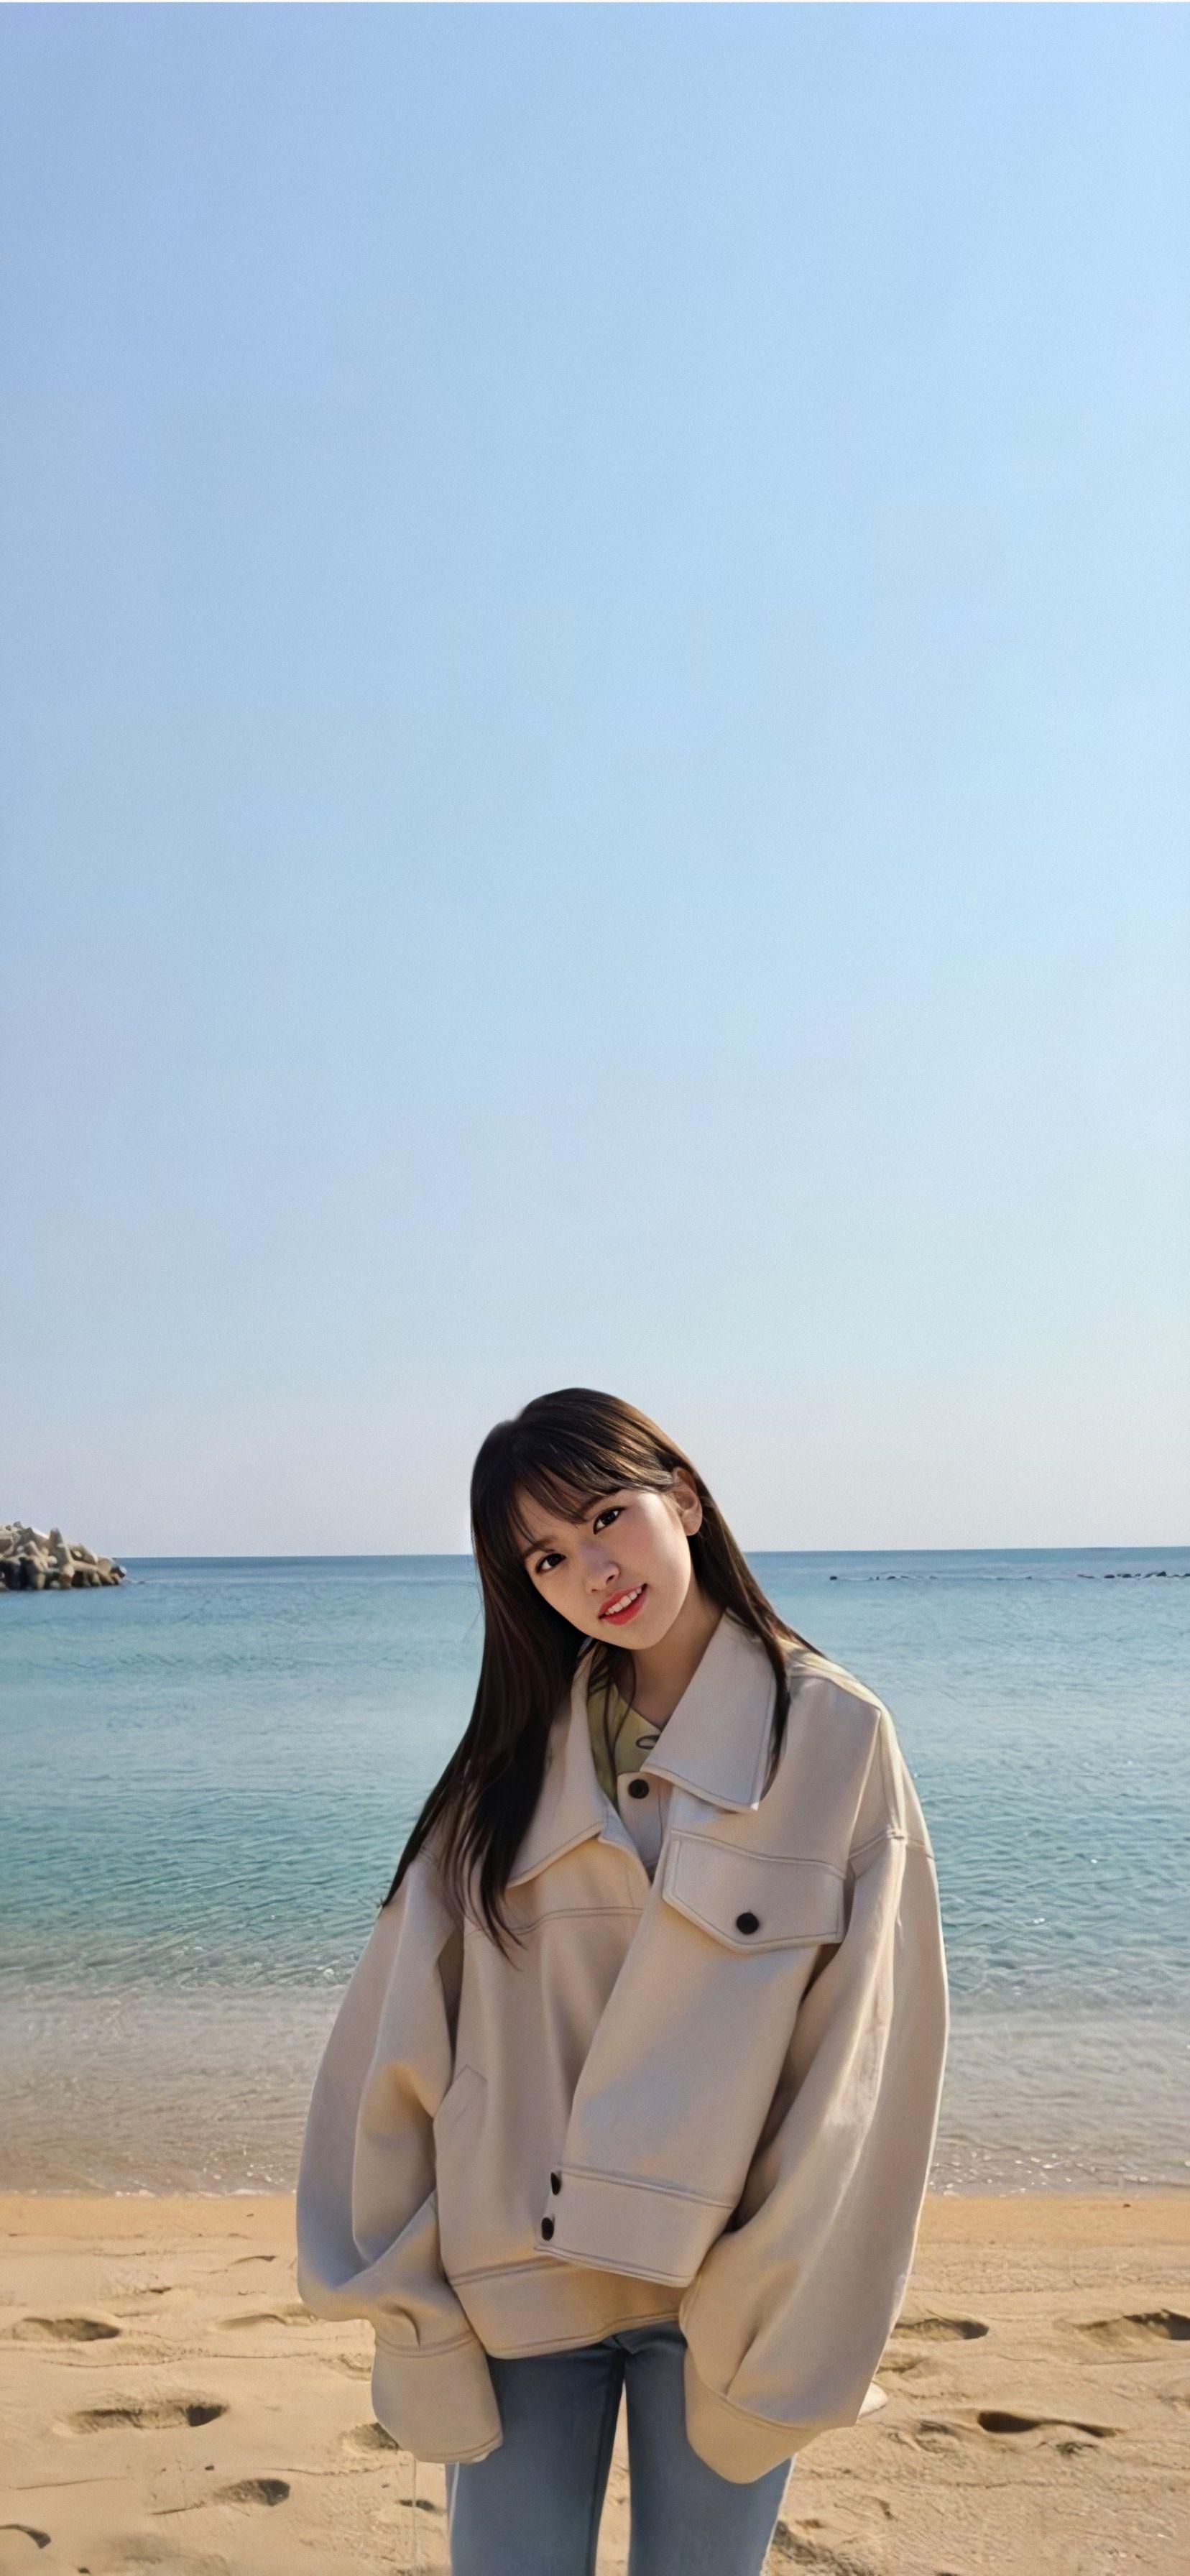 Ahn Yujin Wallpaper Kpop Girls Kpop Wallpaper Japanese Girl Group